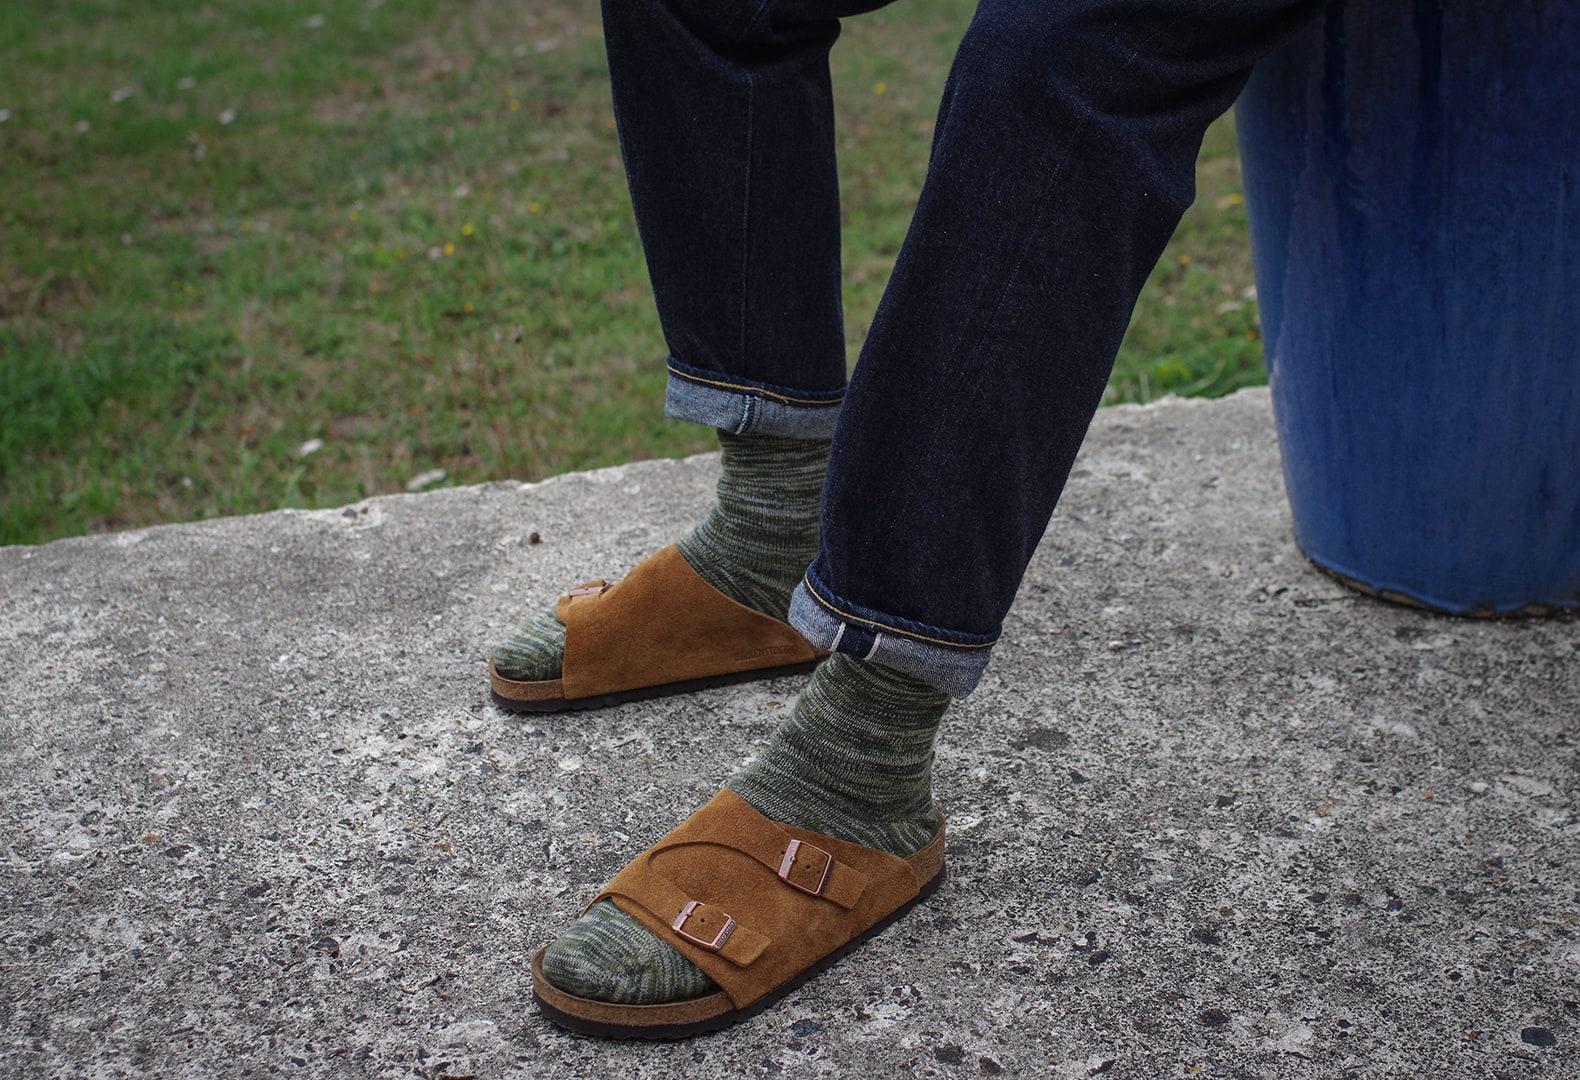 porter des chaussettes avec des birkenstock zurich mink